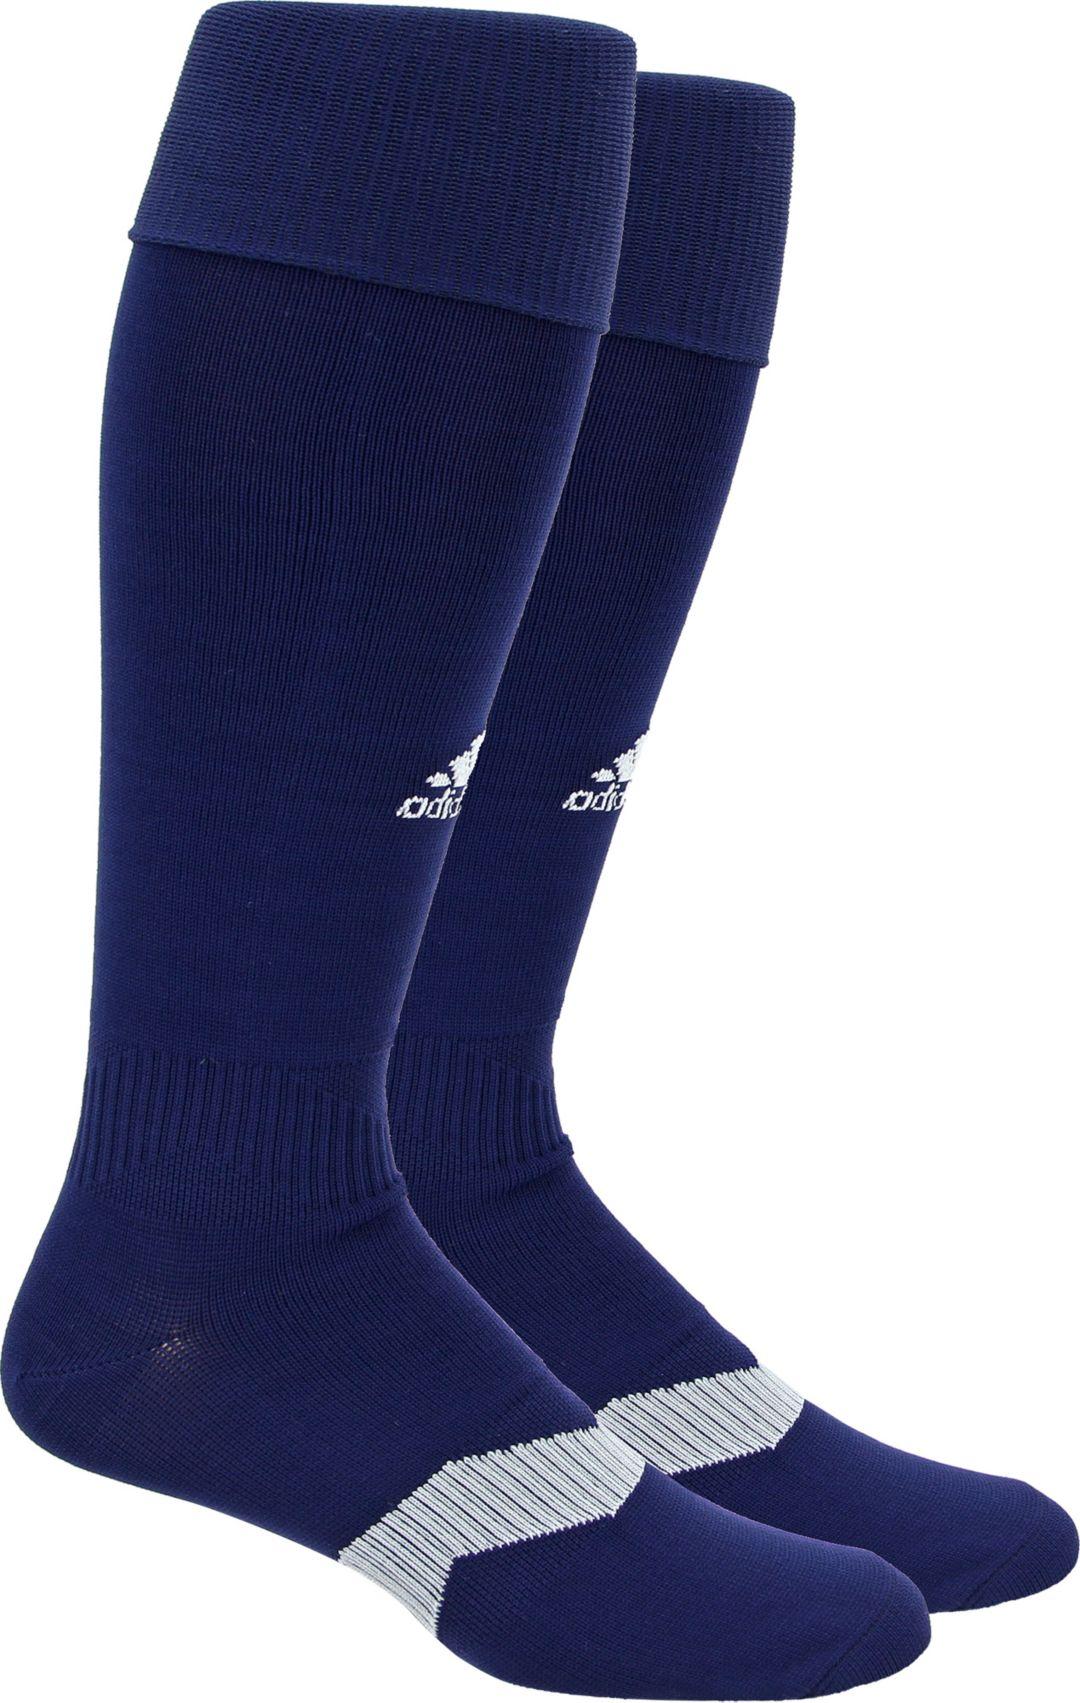 3c59441f3 adidas Metro IV OTC Soccer Socks. noImageFound. Previous. 1. 2